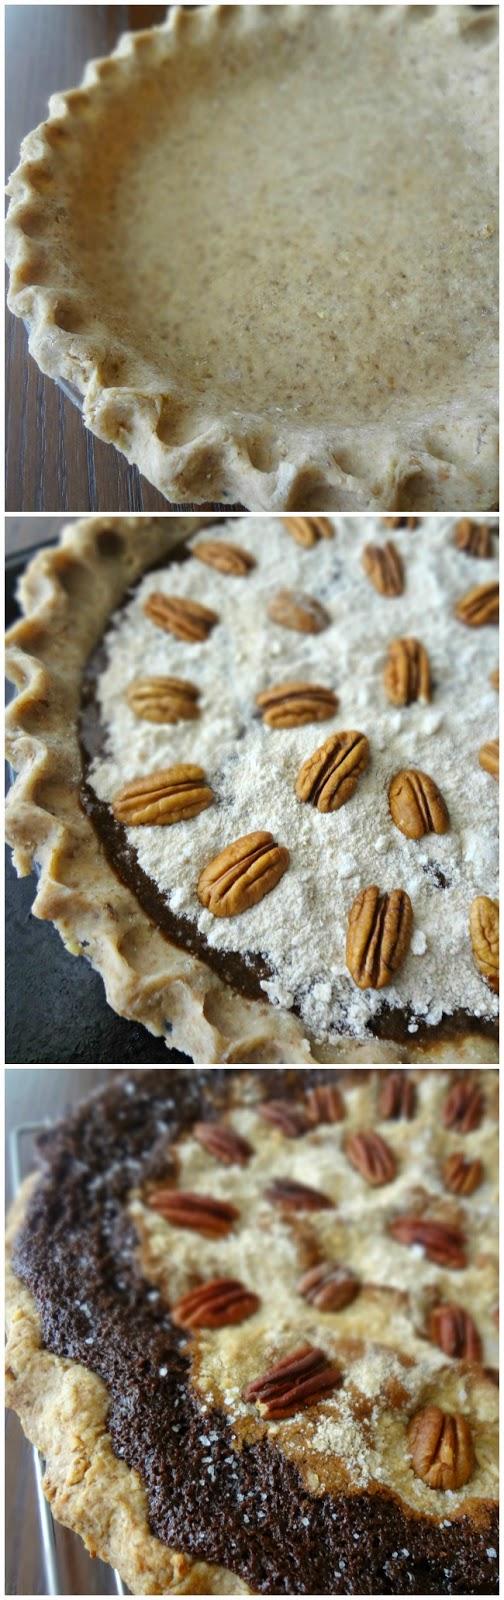 Chocolate Shoofly Pie with Pecan Whole Wheat Crust